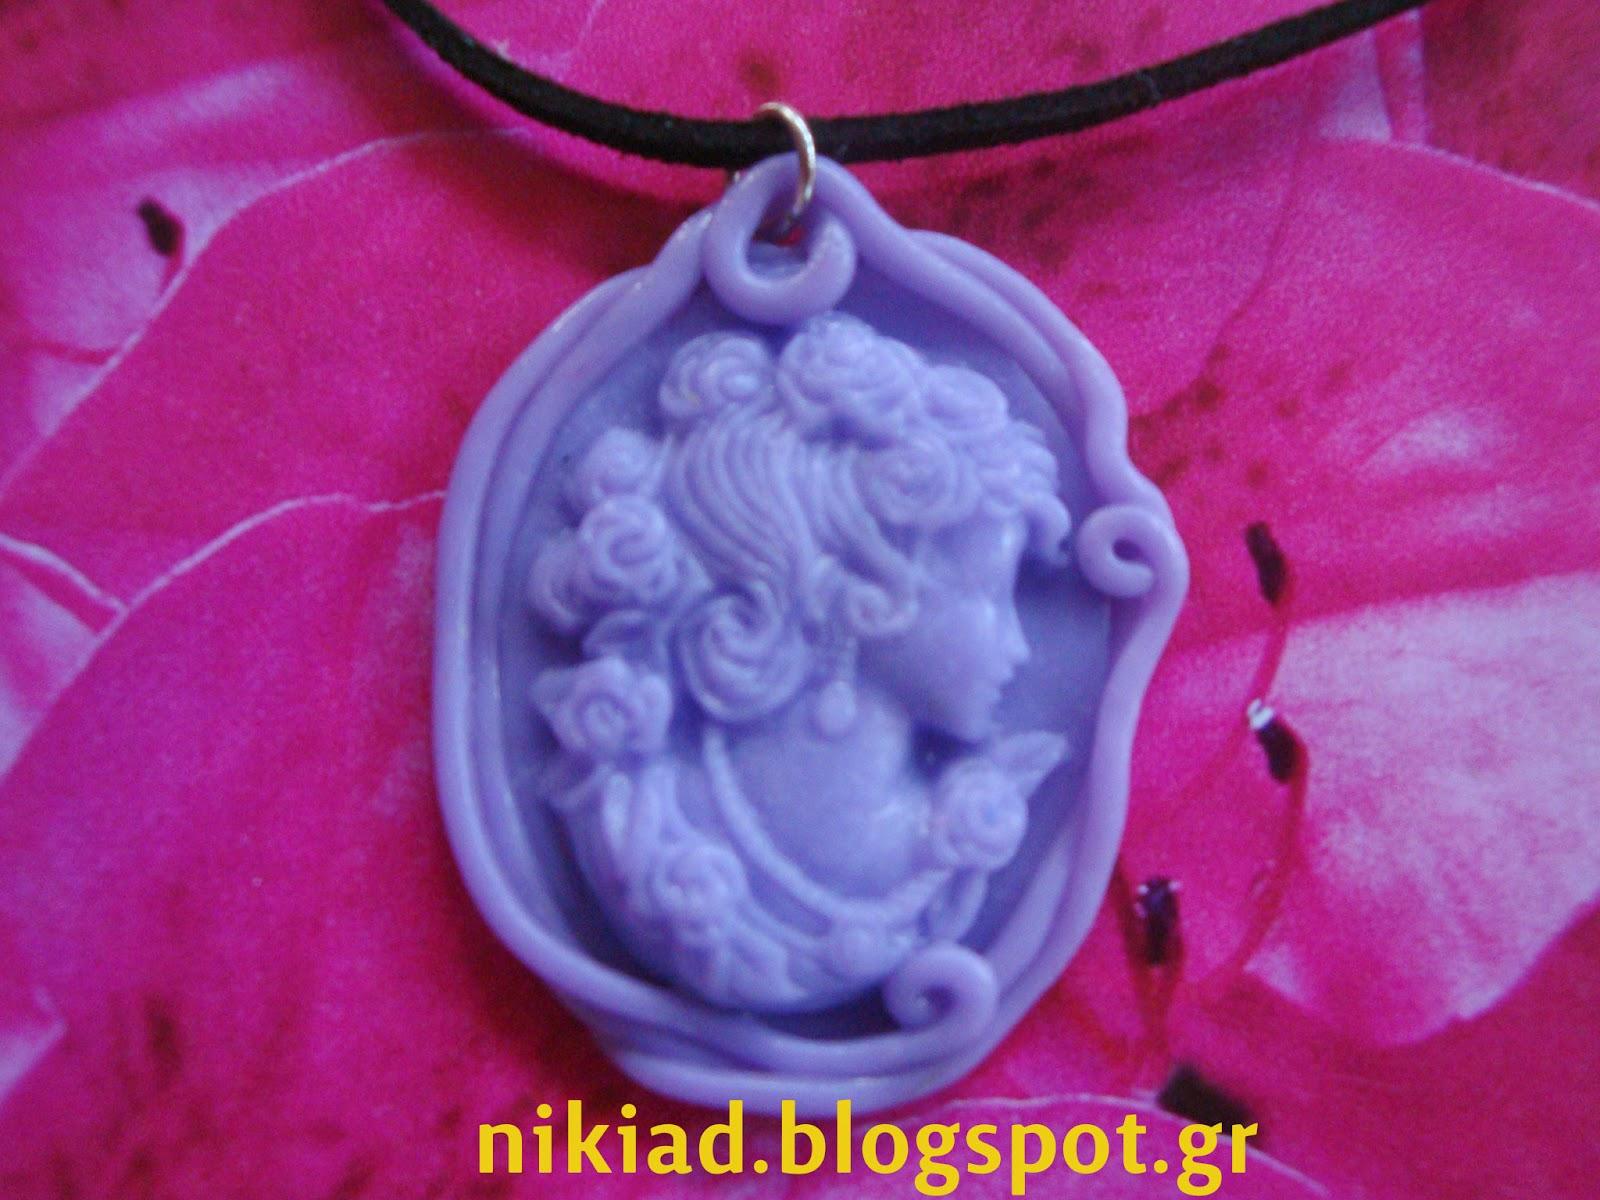 http://nikiad.blogspot.gr/2014/03/polymer-clay-cameo-jewellery.html